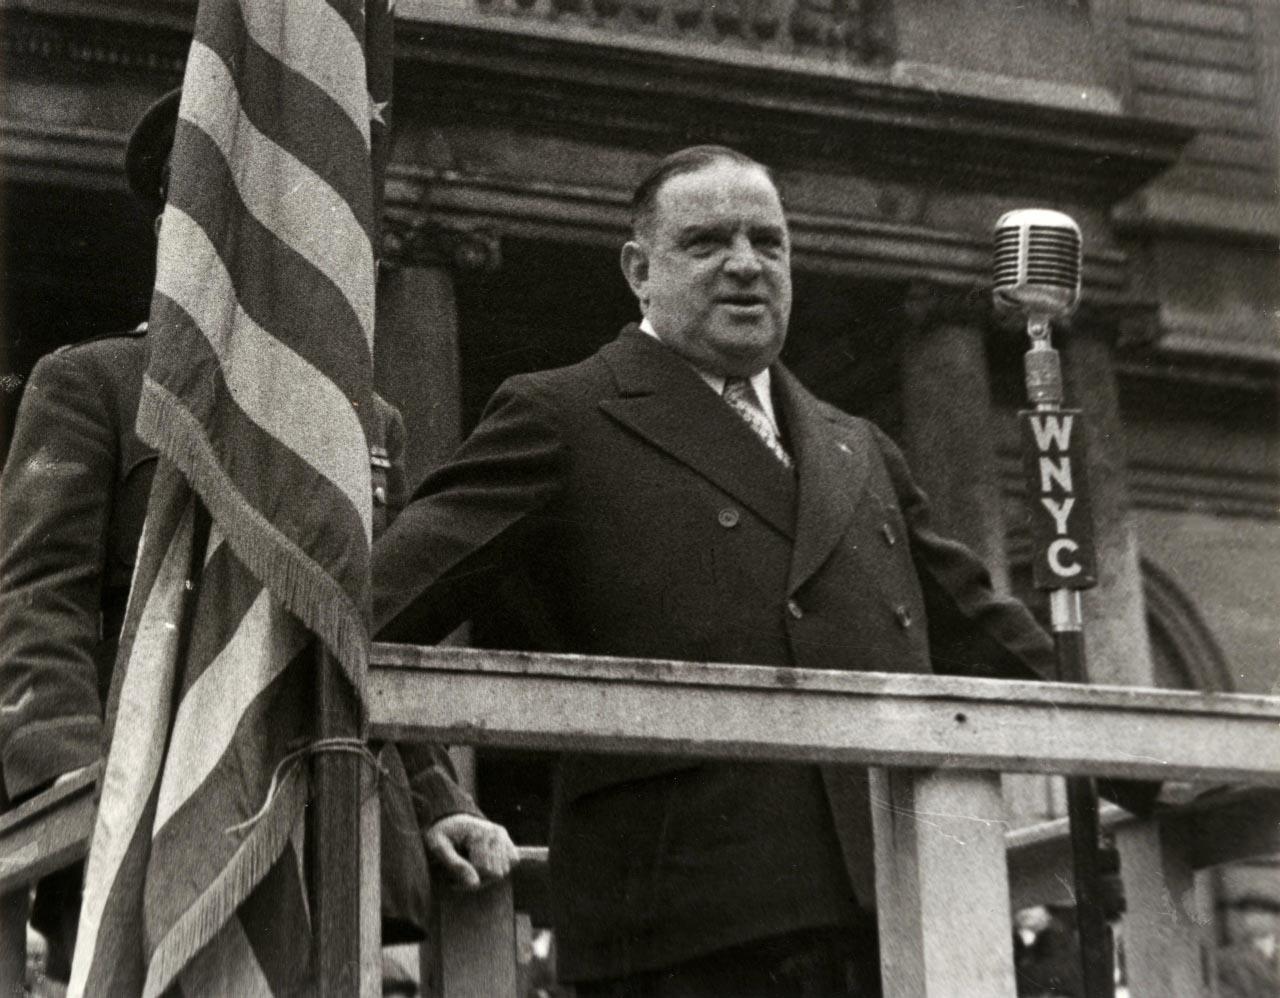 Il sindaco di New York nella <em>Vita promessa</em> (Rai1) era l'eroe di Renzo Arbore